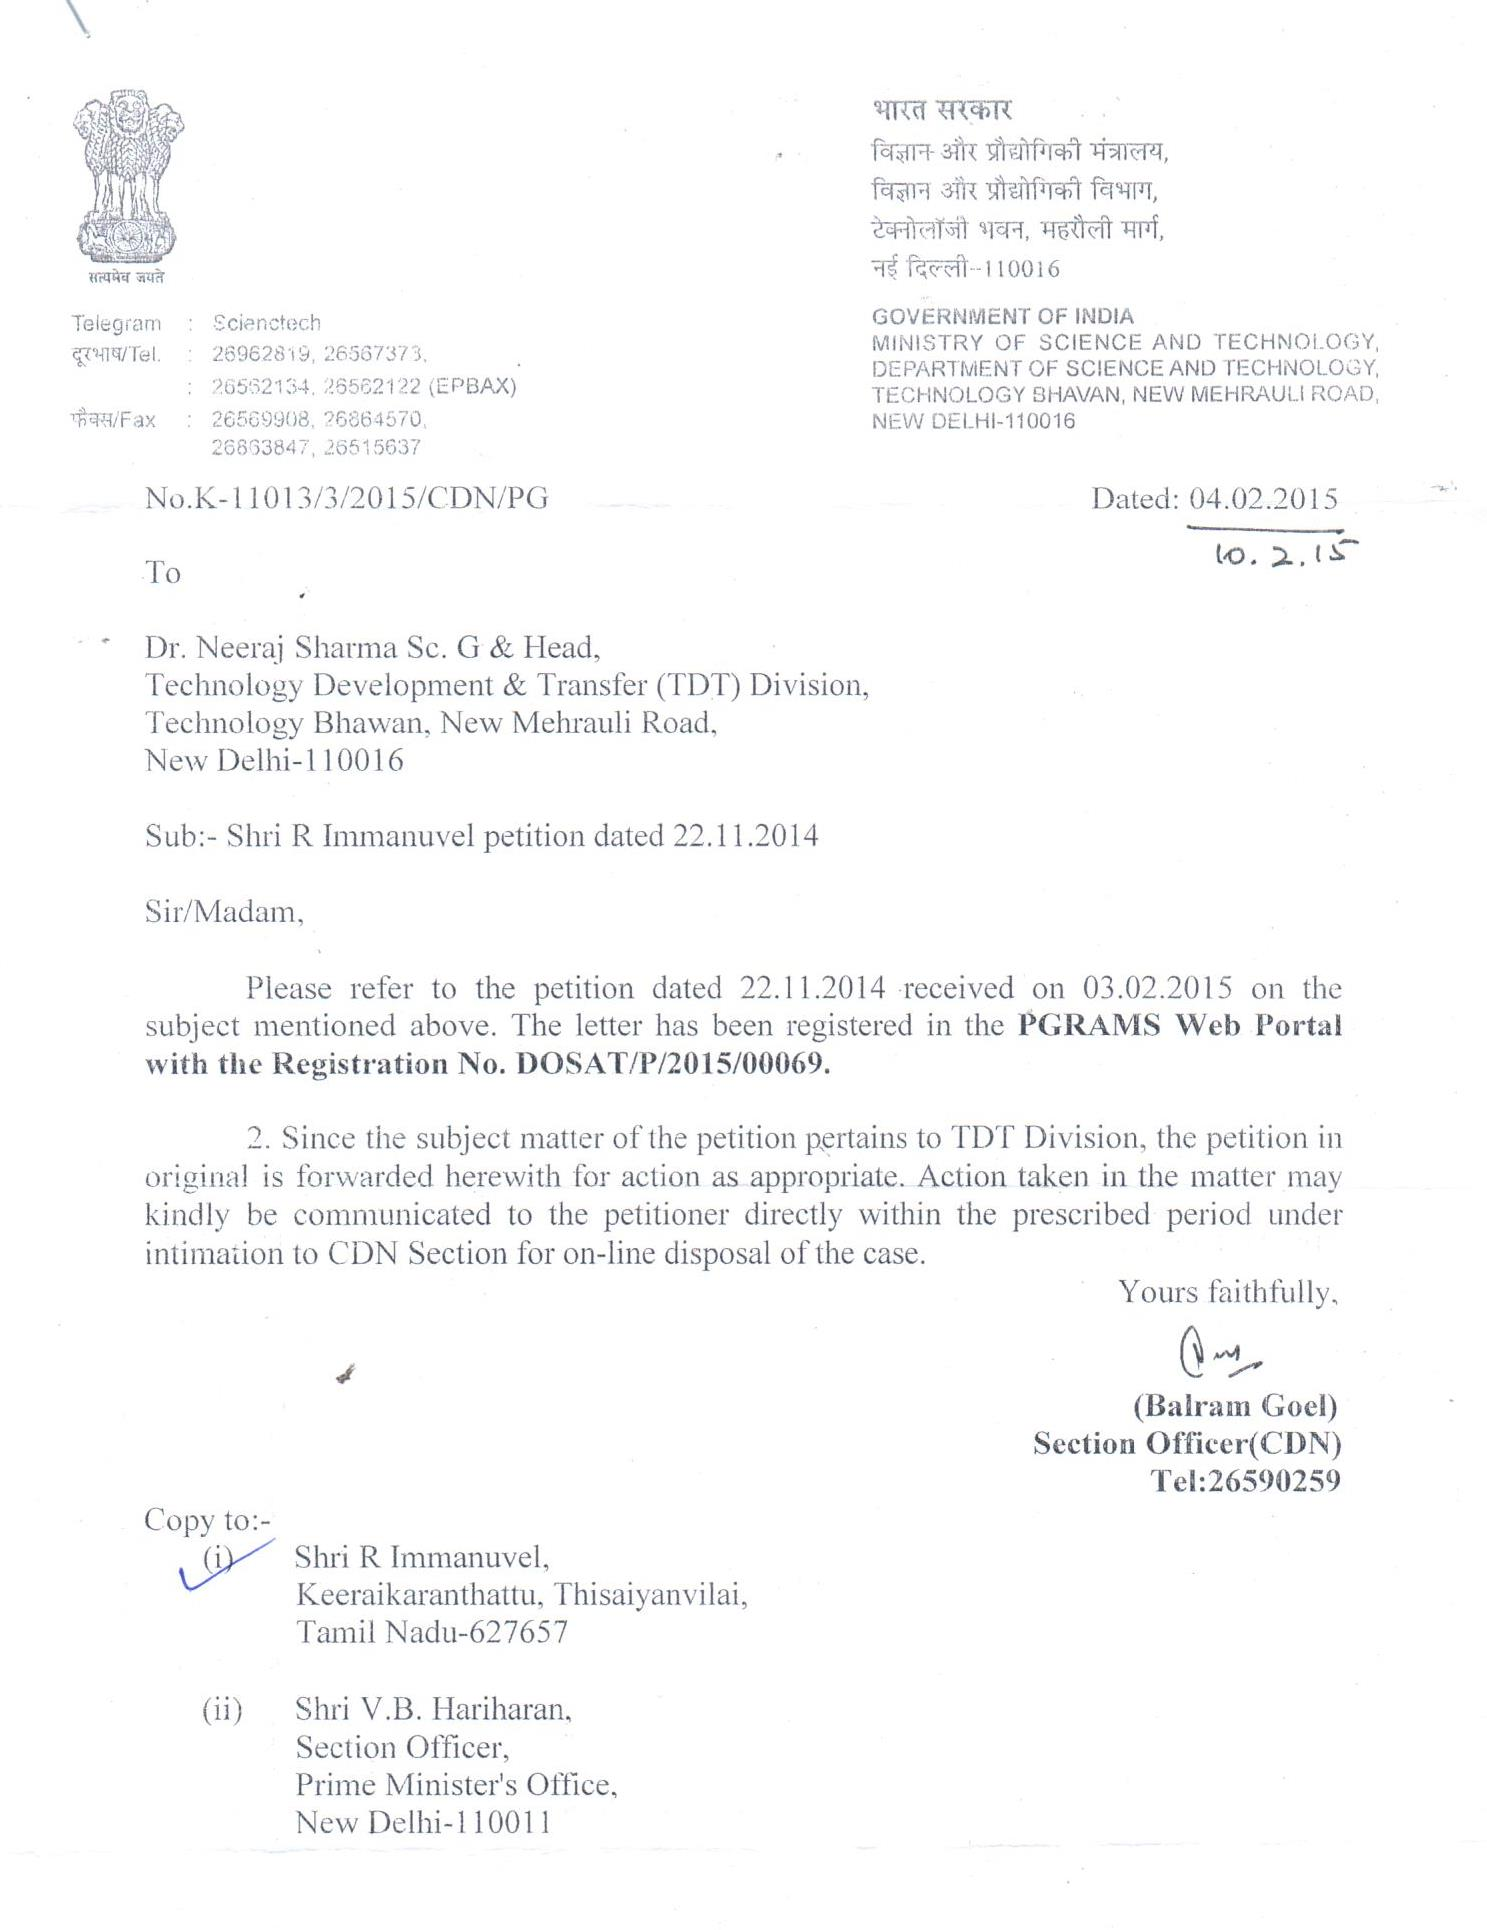 Dept of Science and Tech - complaint registering details